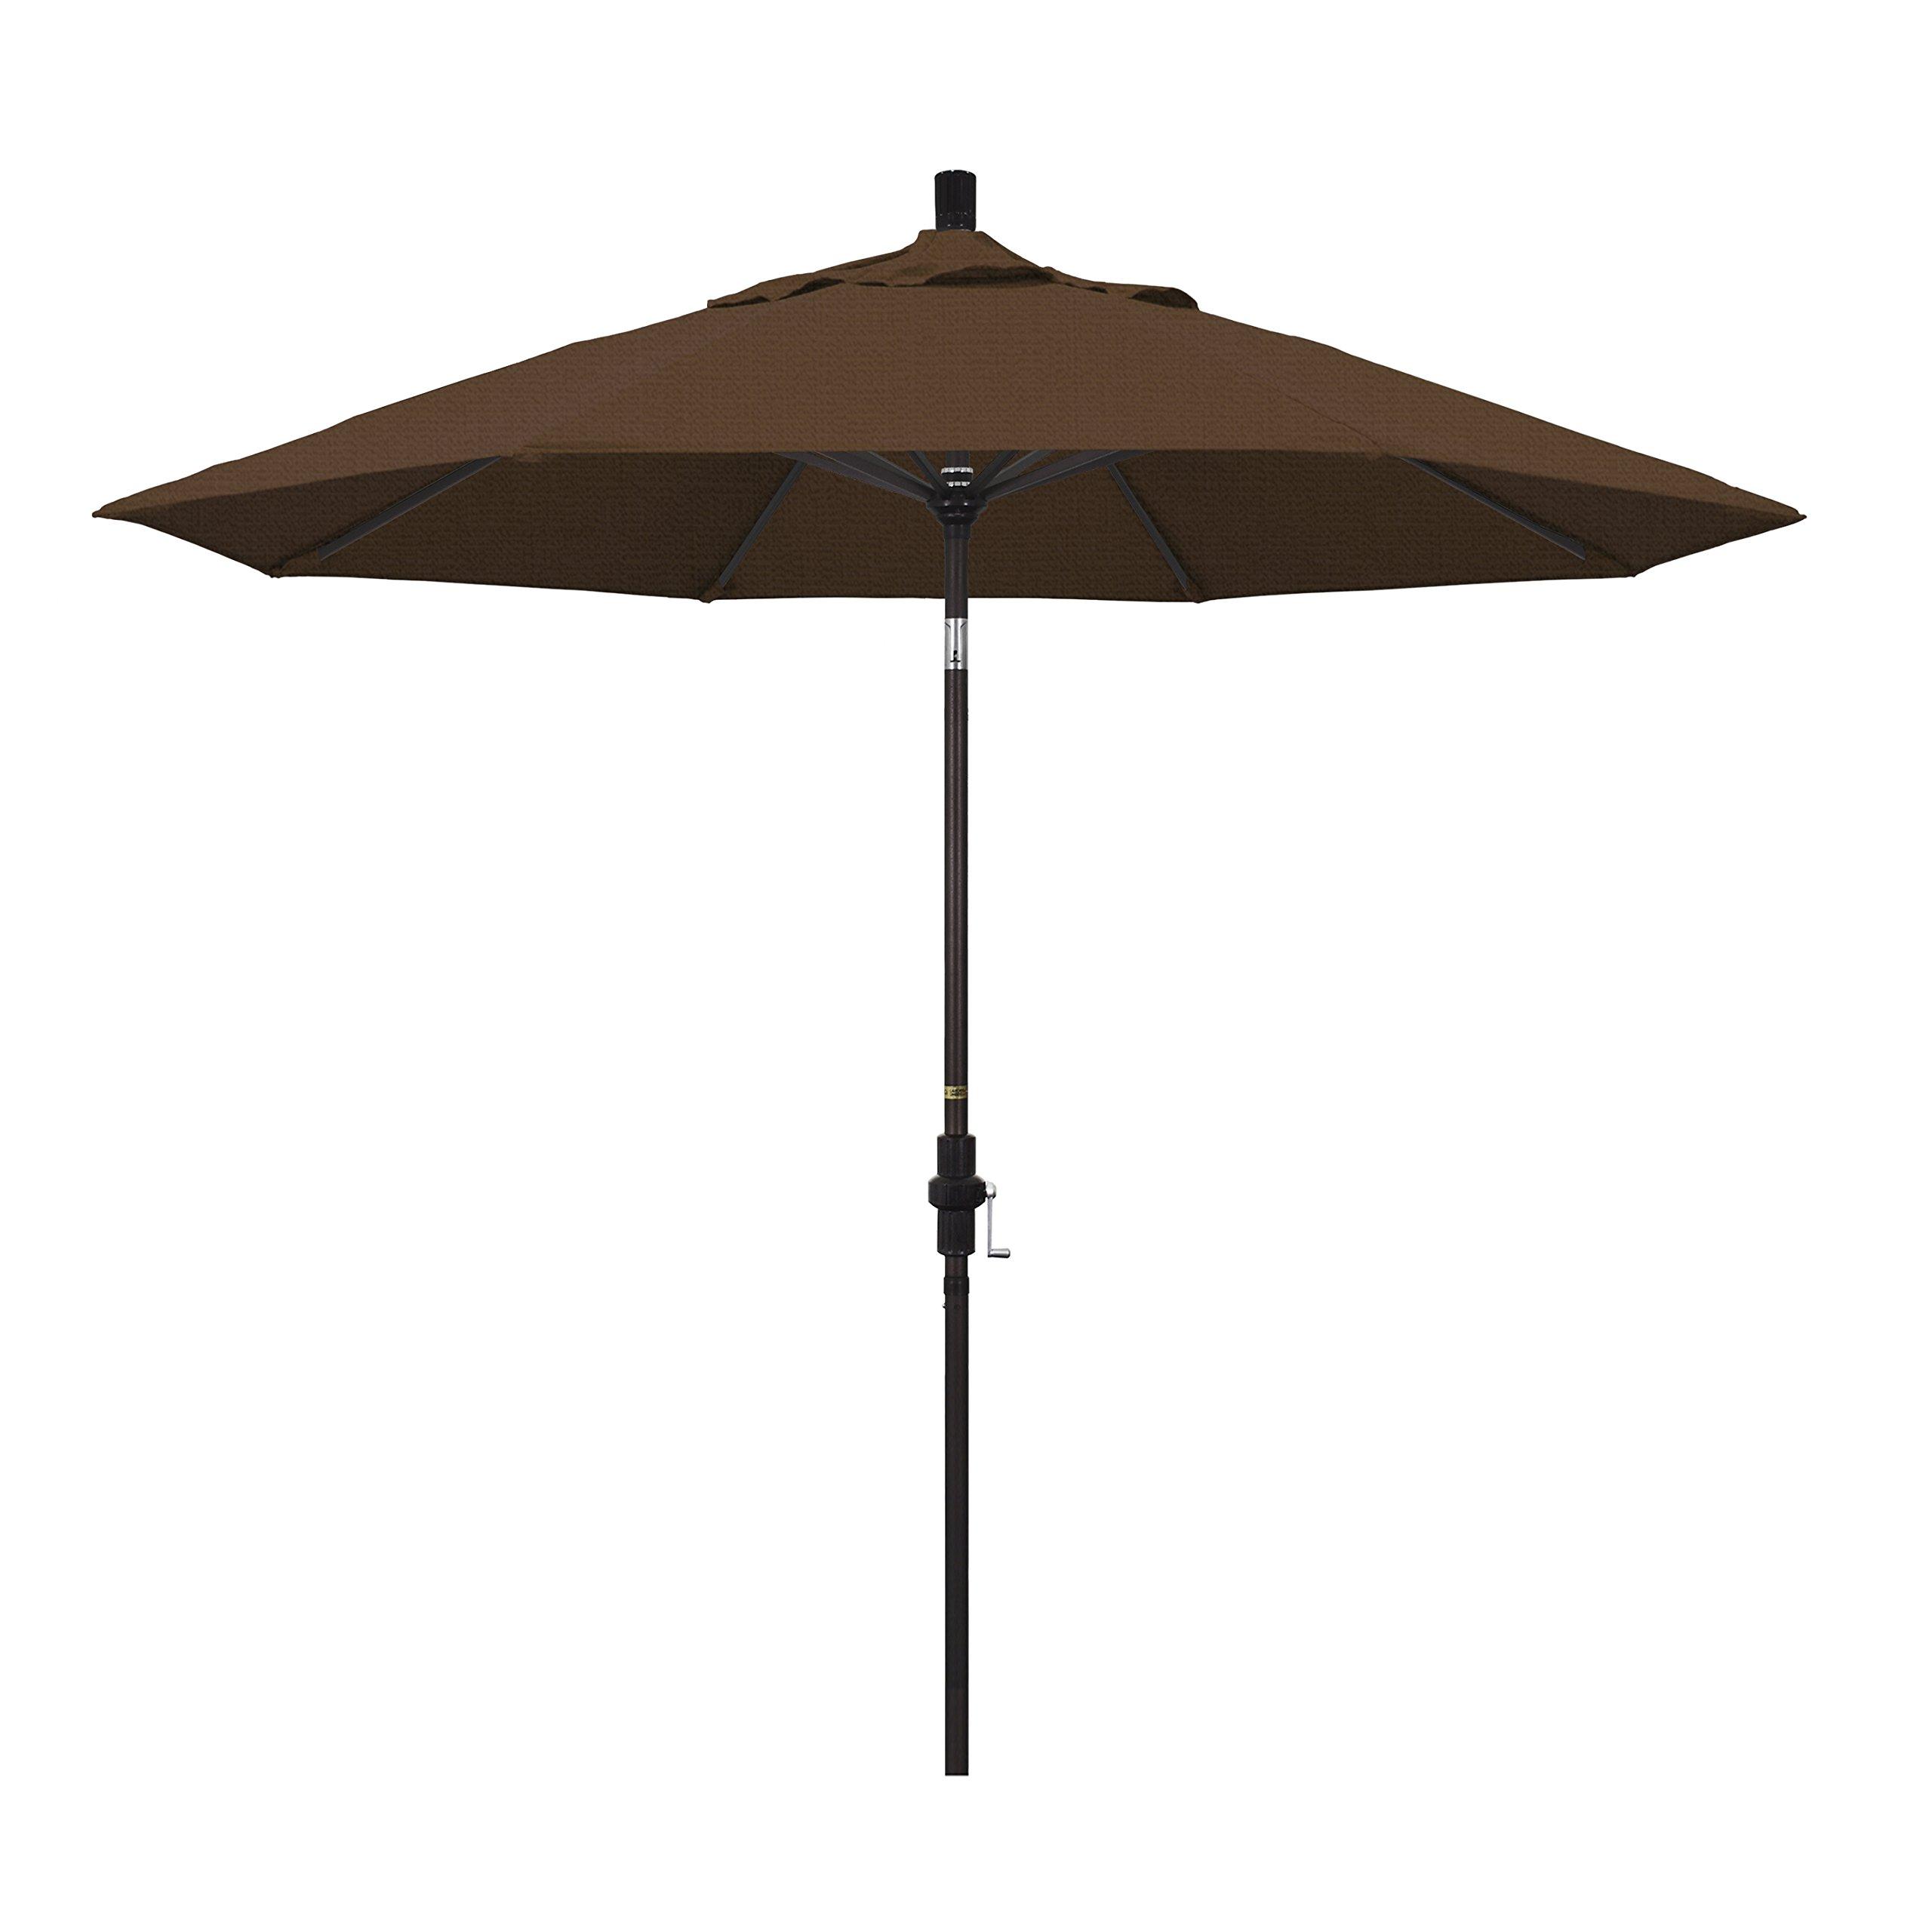 Amazon Com California Umbrella Gscu908117 F71 9 Round Aluminum Market Crank Lift Collar Tilt Bronze Pole Teak Olefin Patio Umbrella 9 Foot Patio Umbrellas Garden Outdoor